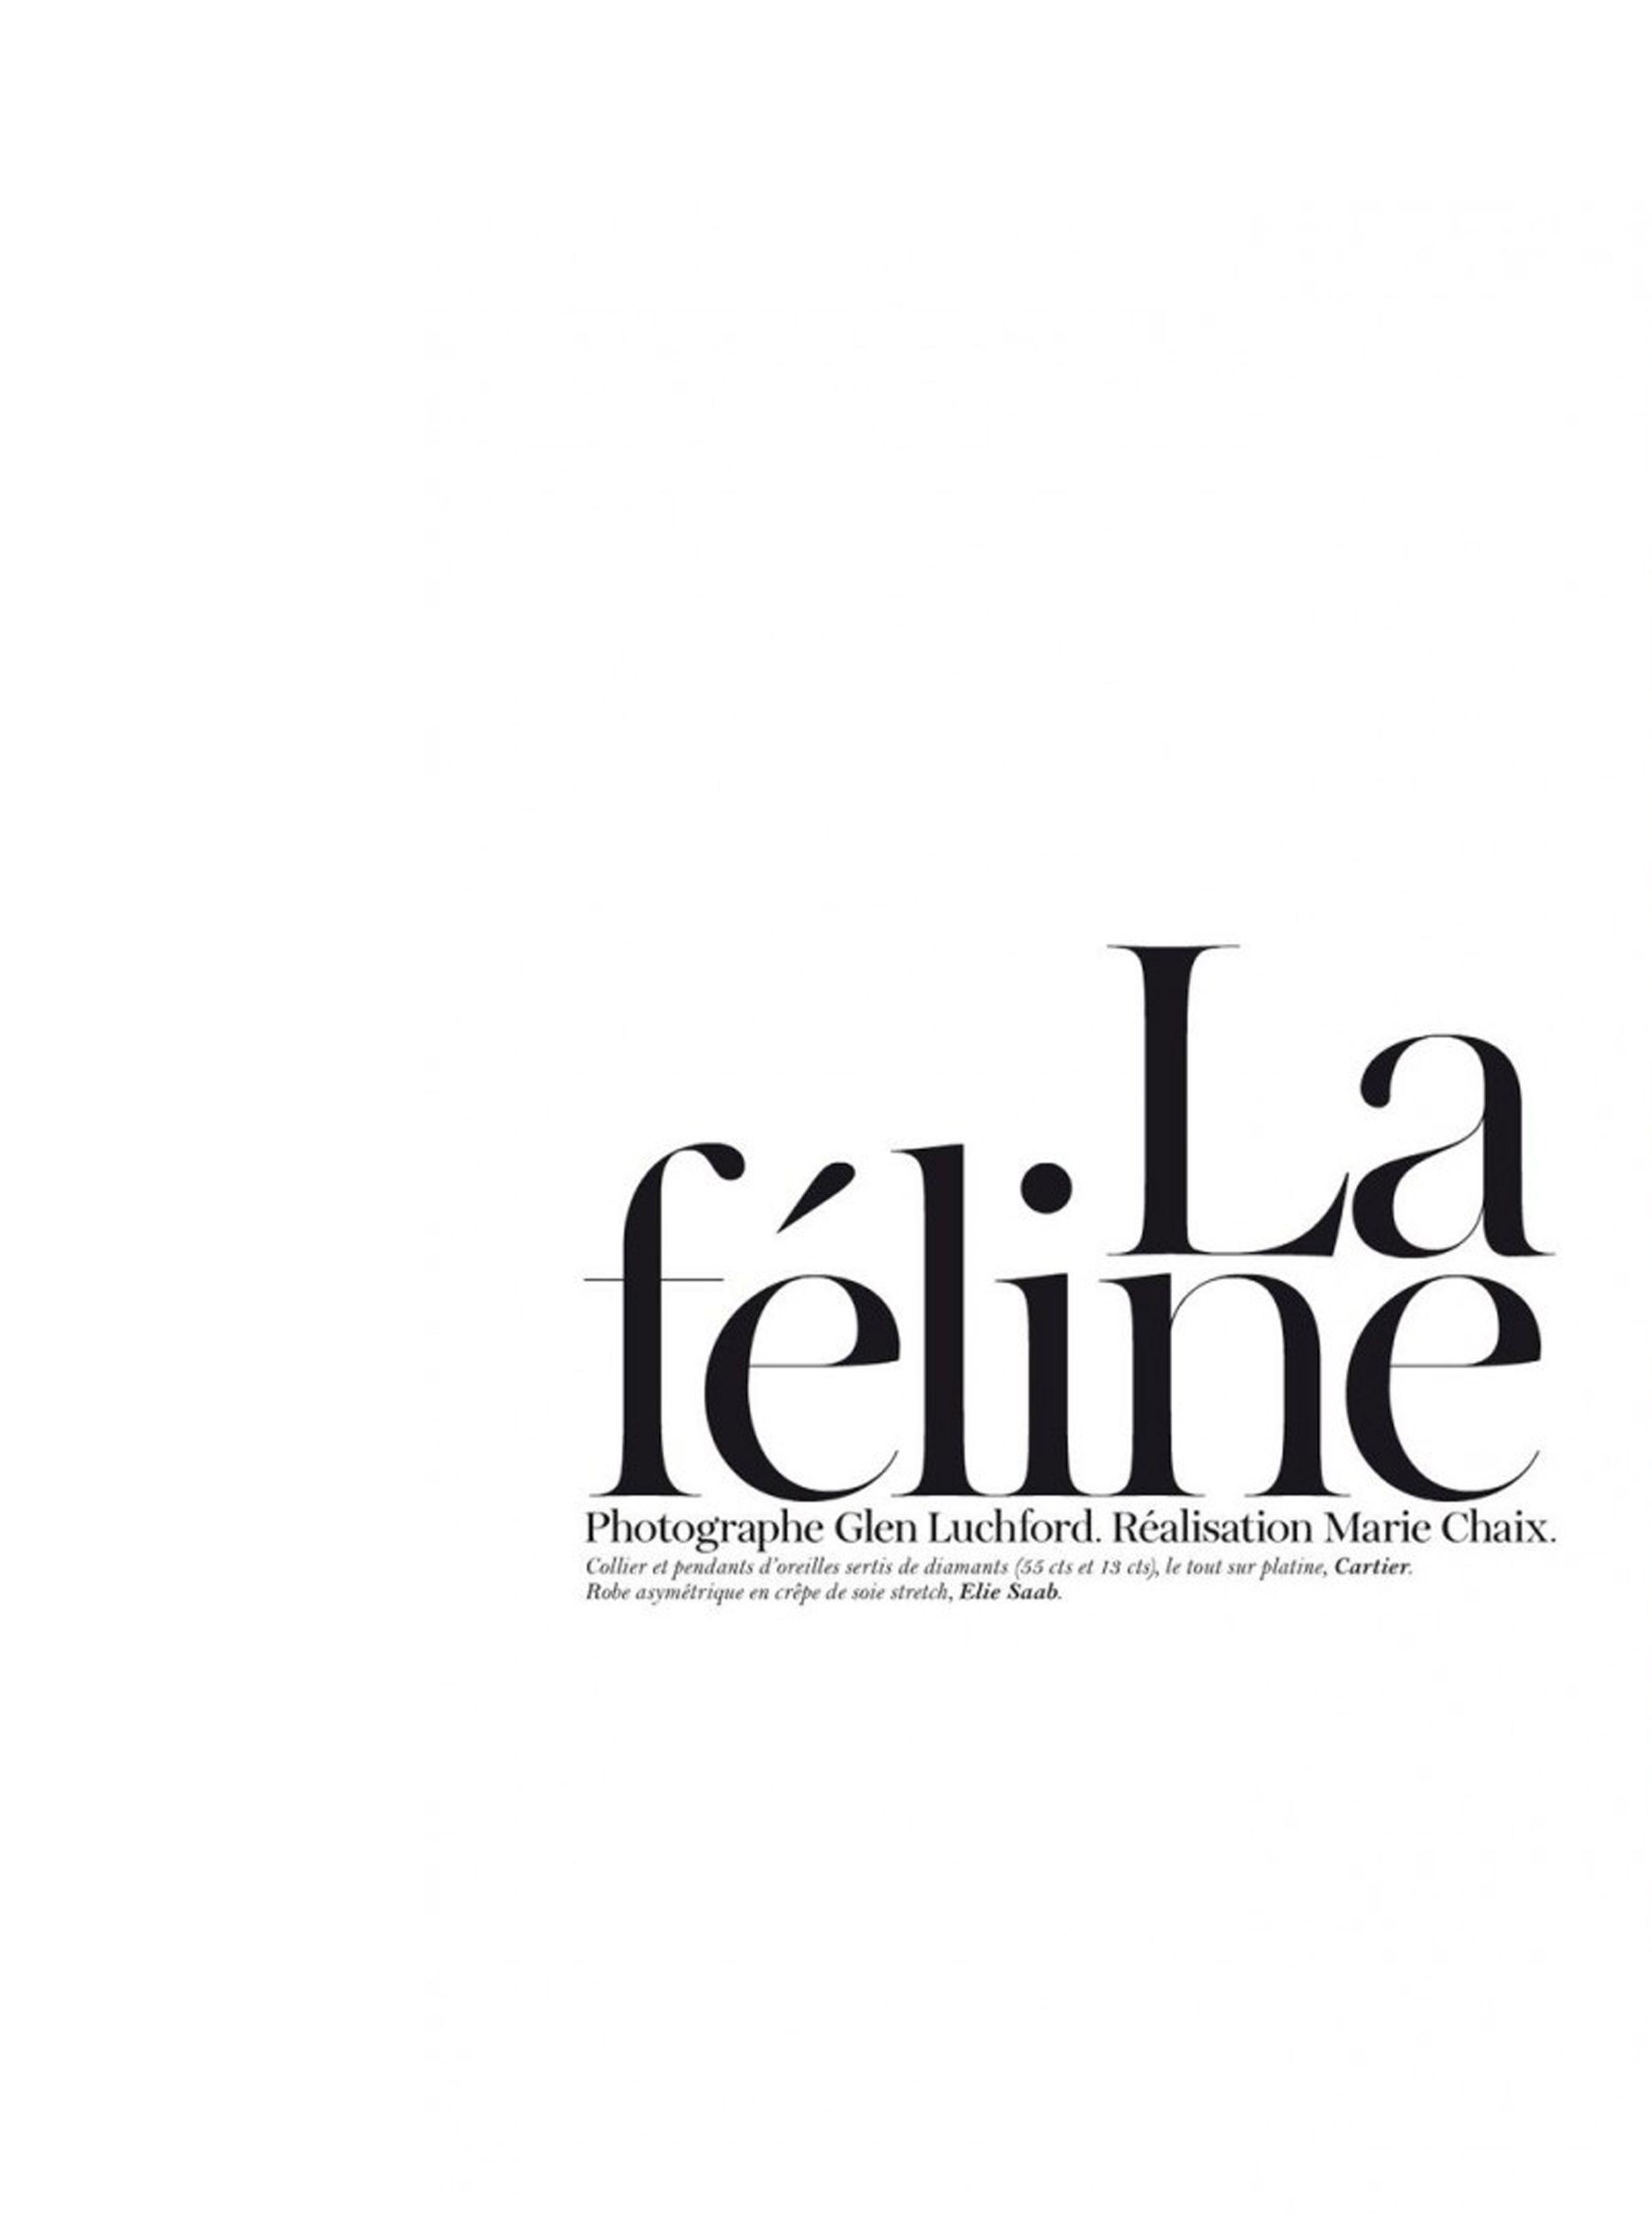 Malgosia Bela by Glen Luchford for Vogue Paris June July